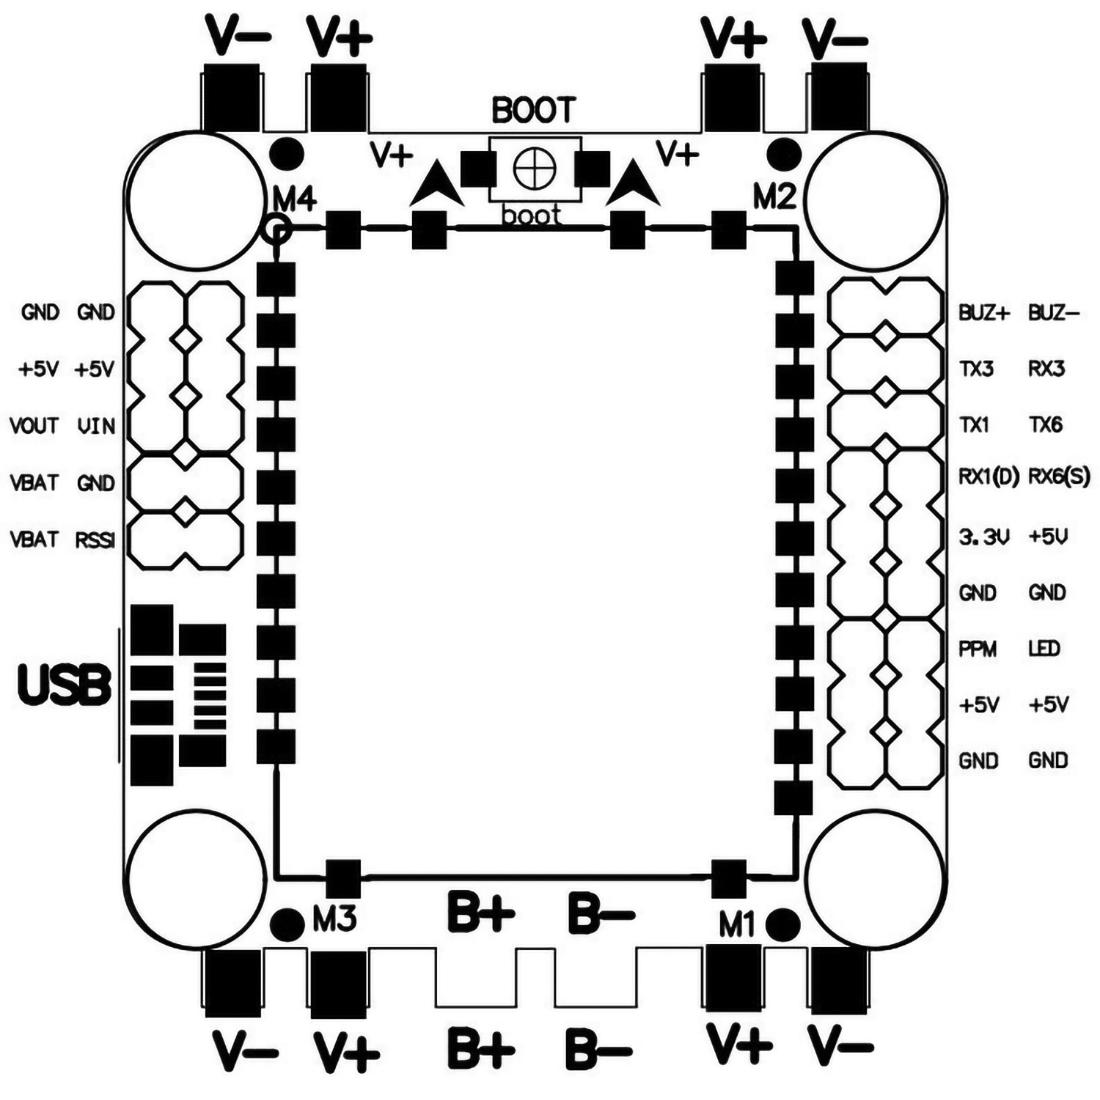 Diy Rc Drone Kit Part F4 Flight Control 35a Esc Brushless